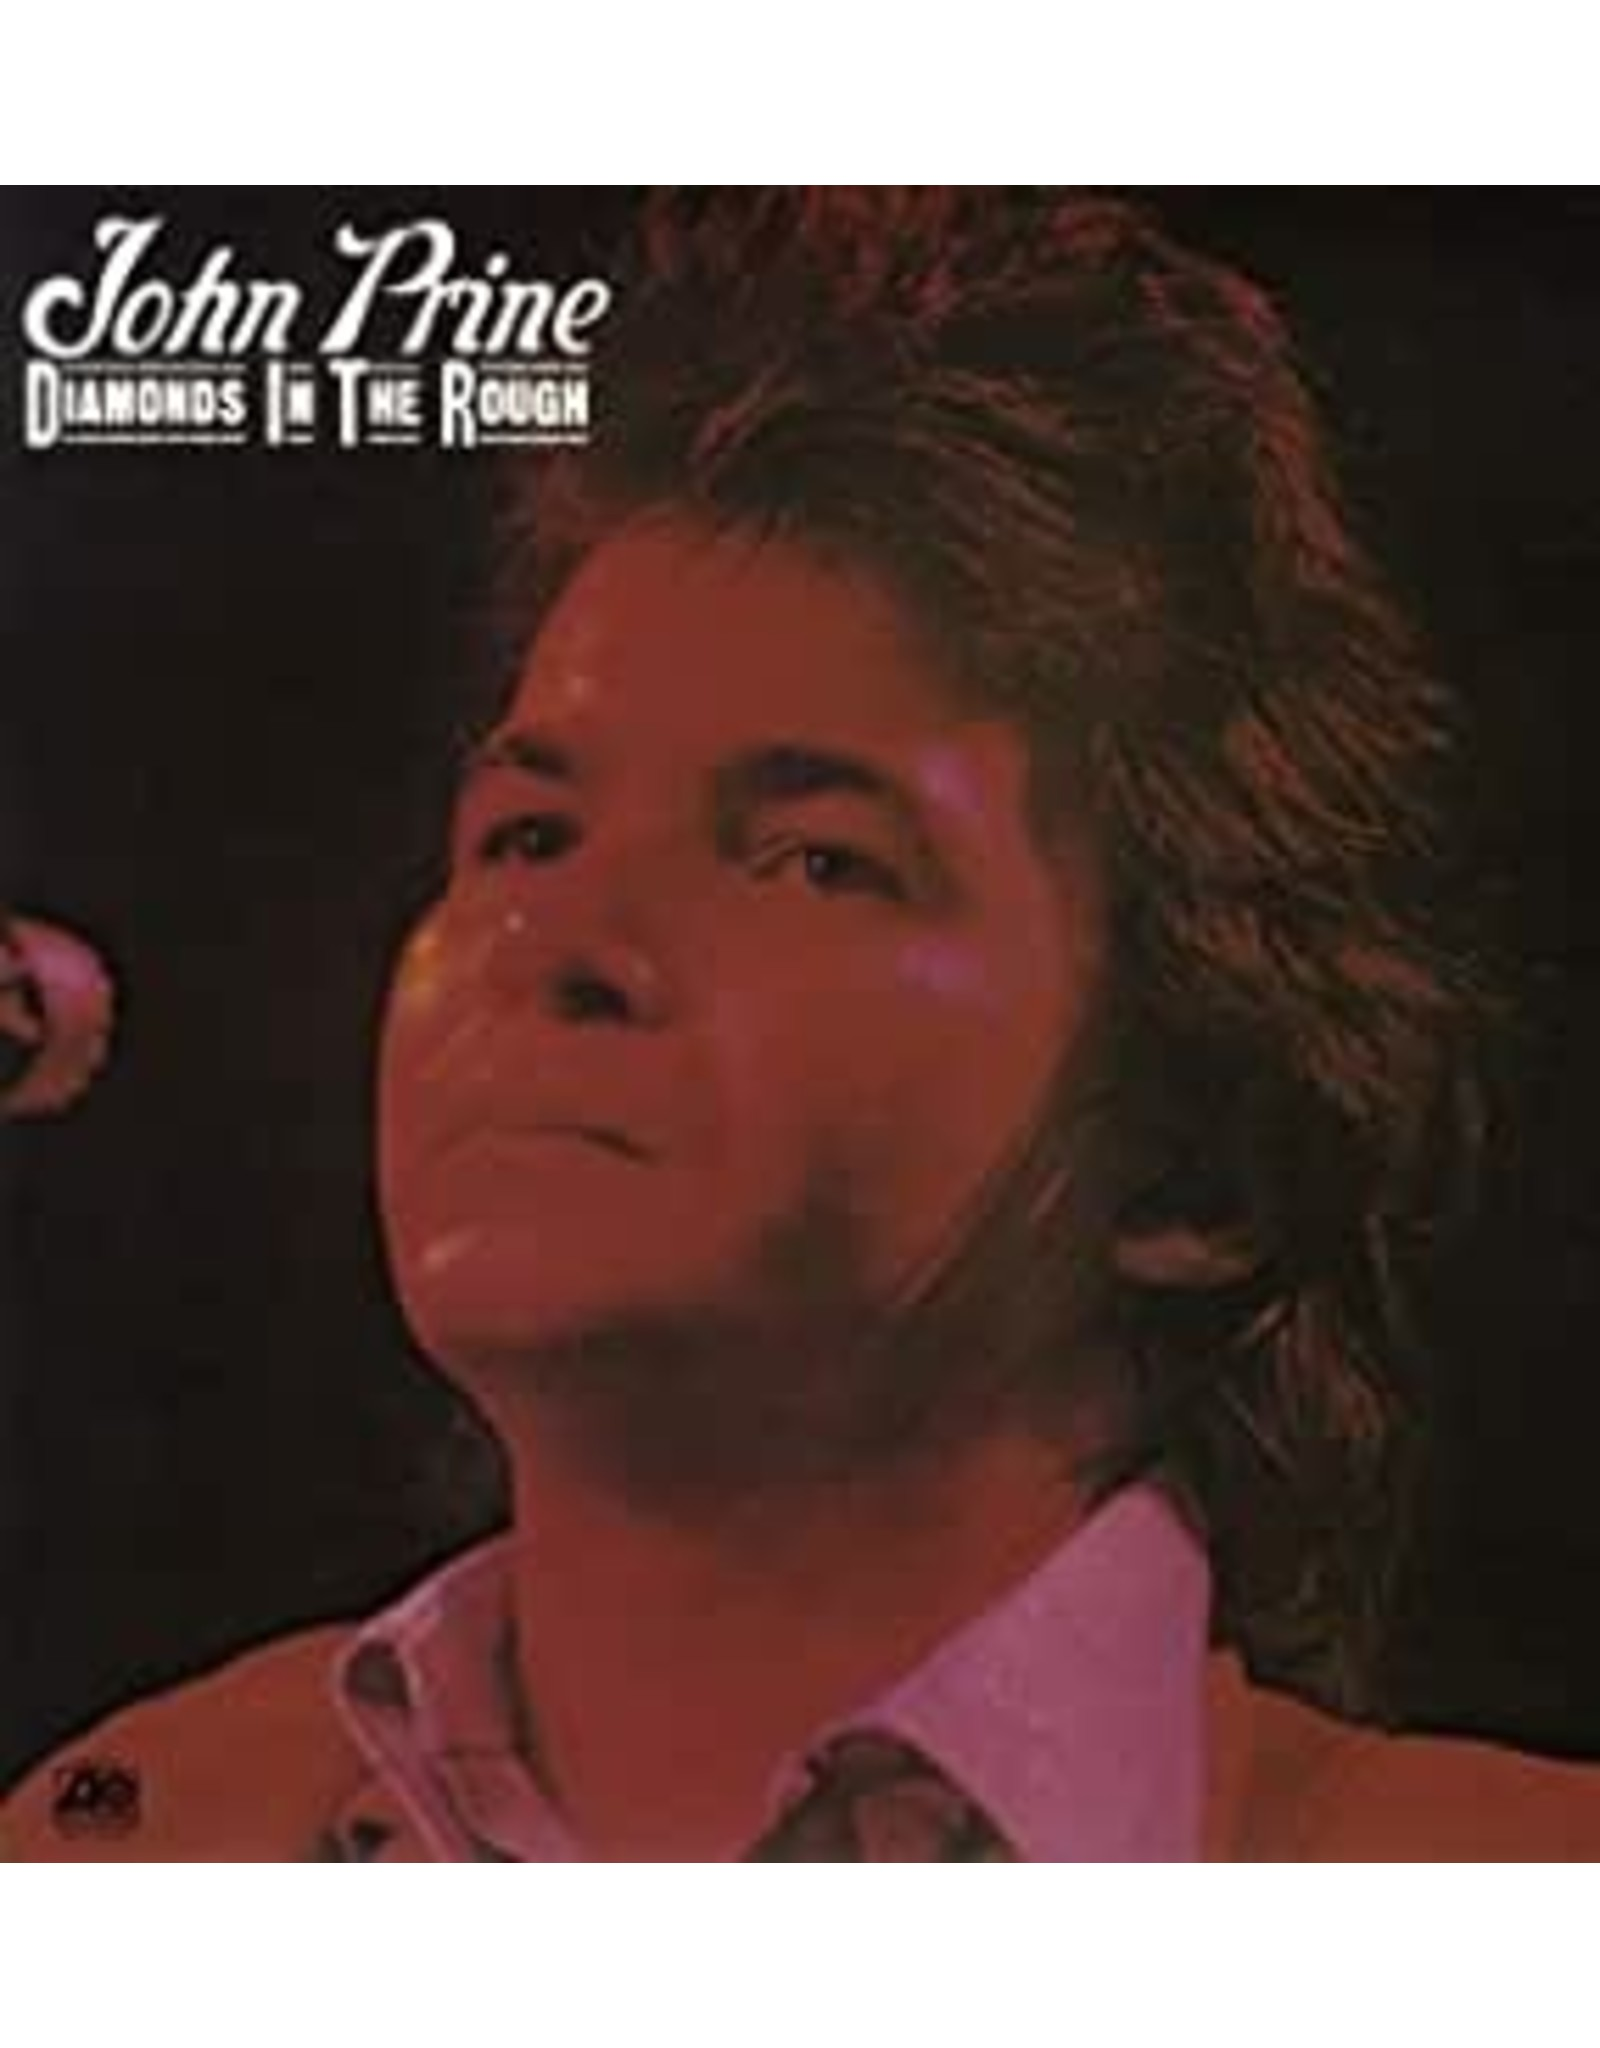 Prine, John - Diamonds In The Rough LP 180G